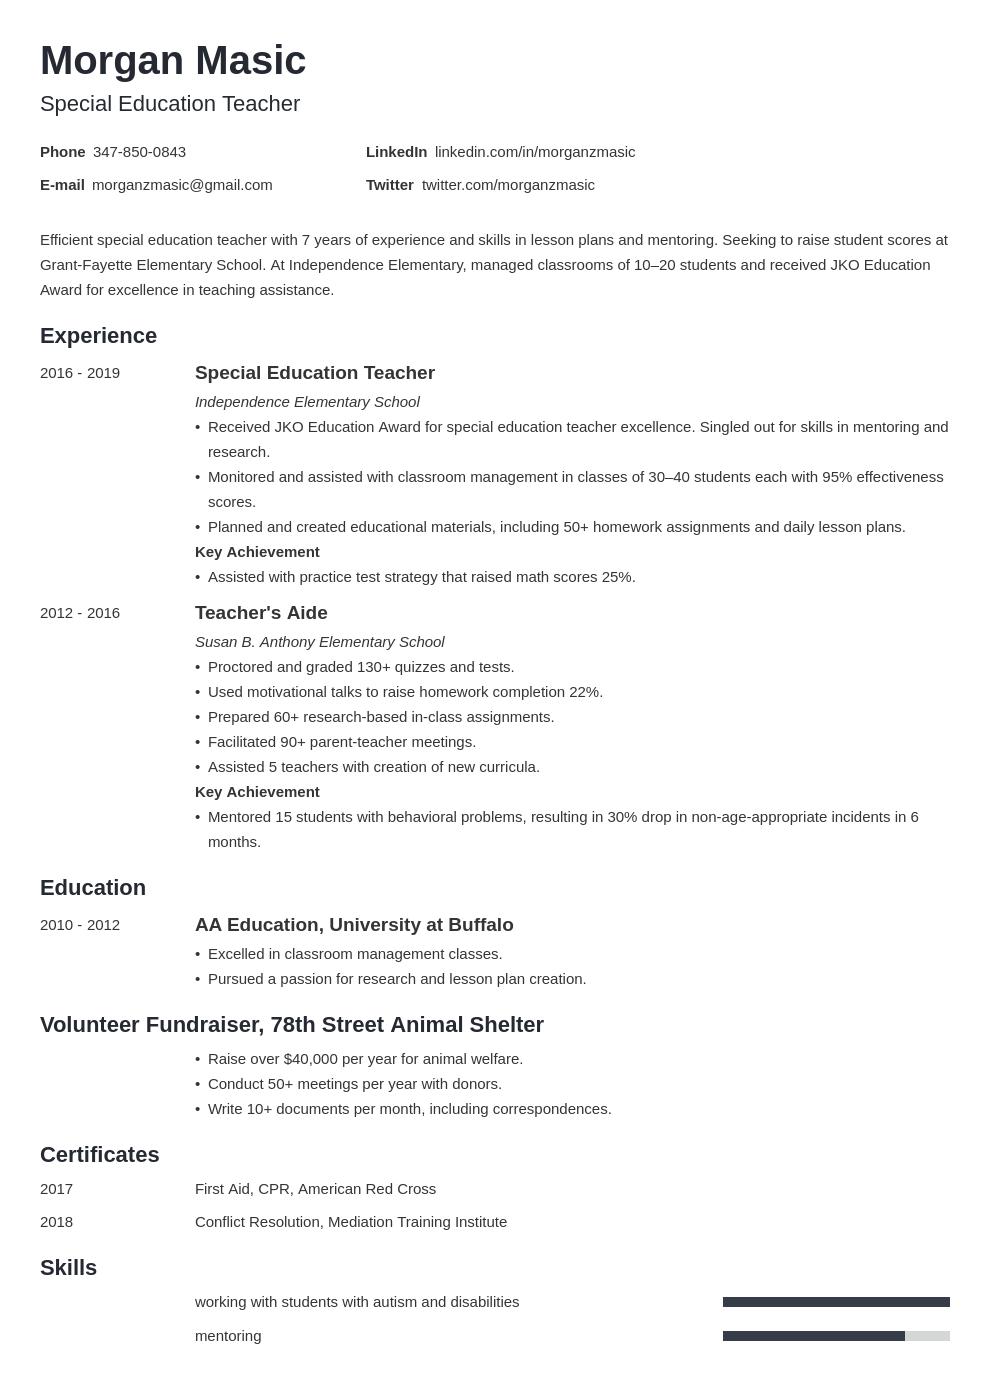 special education teacher template minimo uk